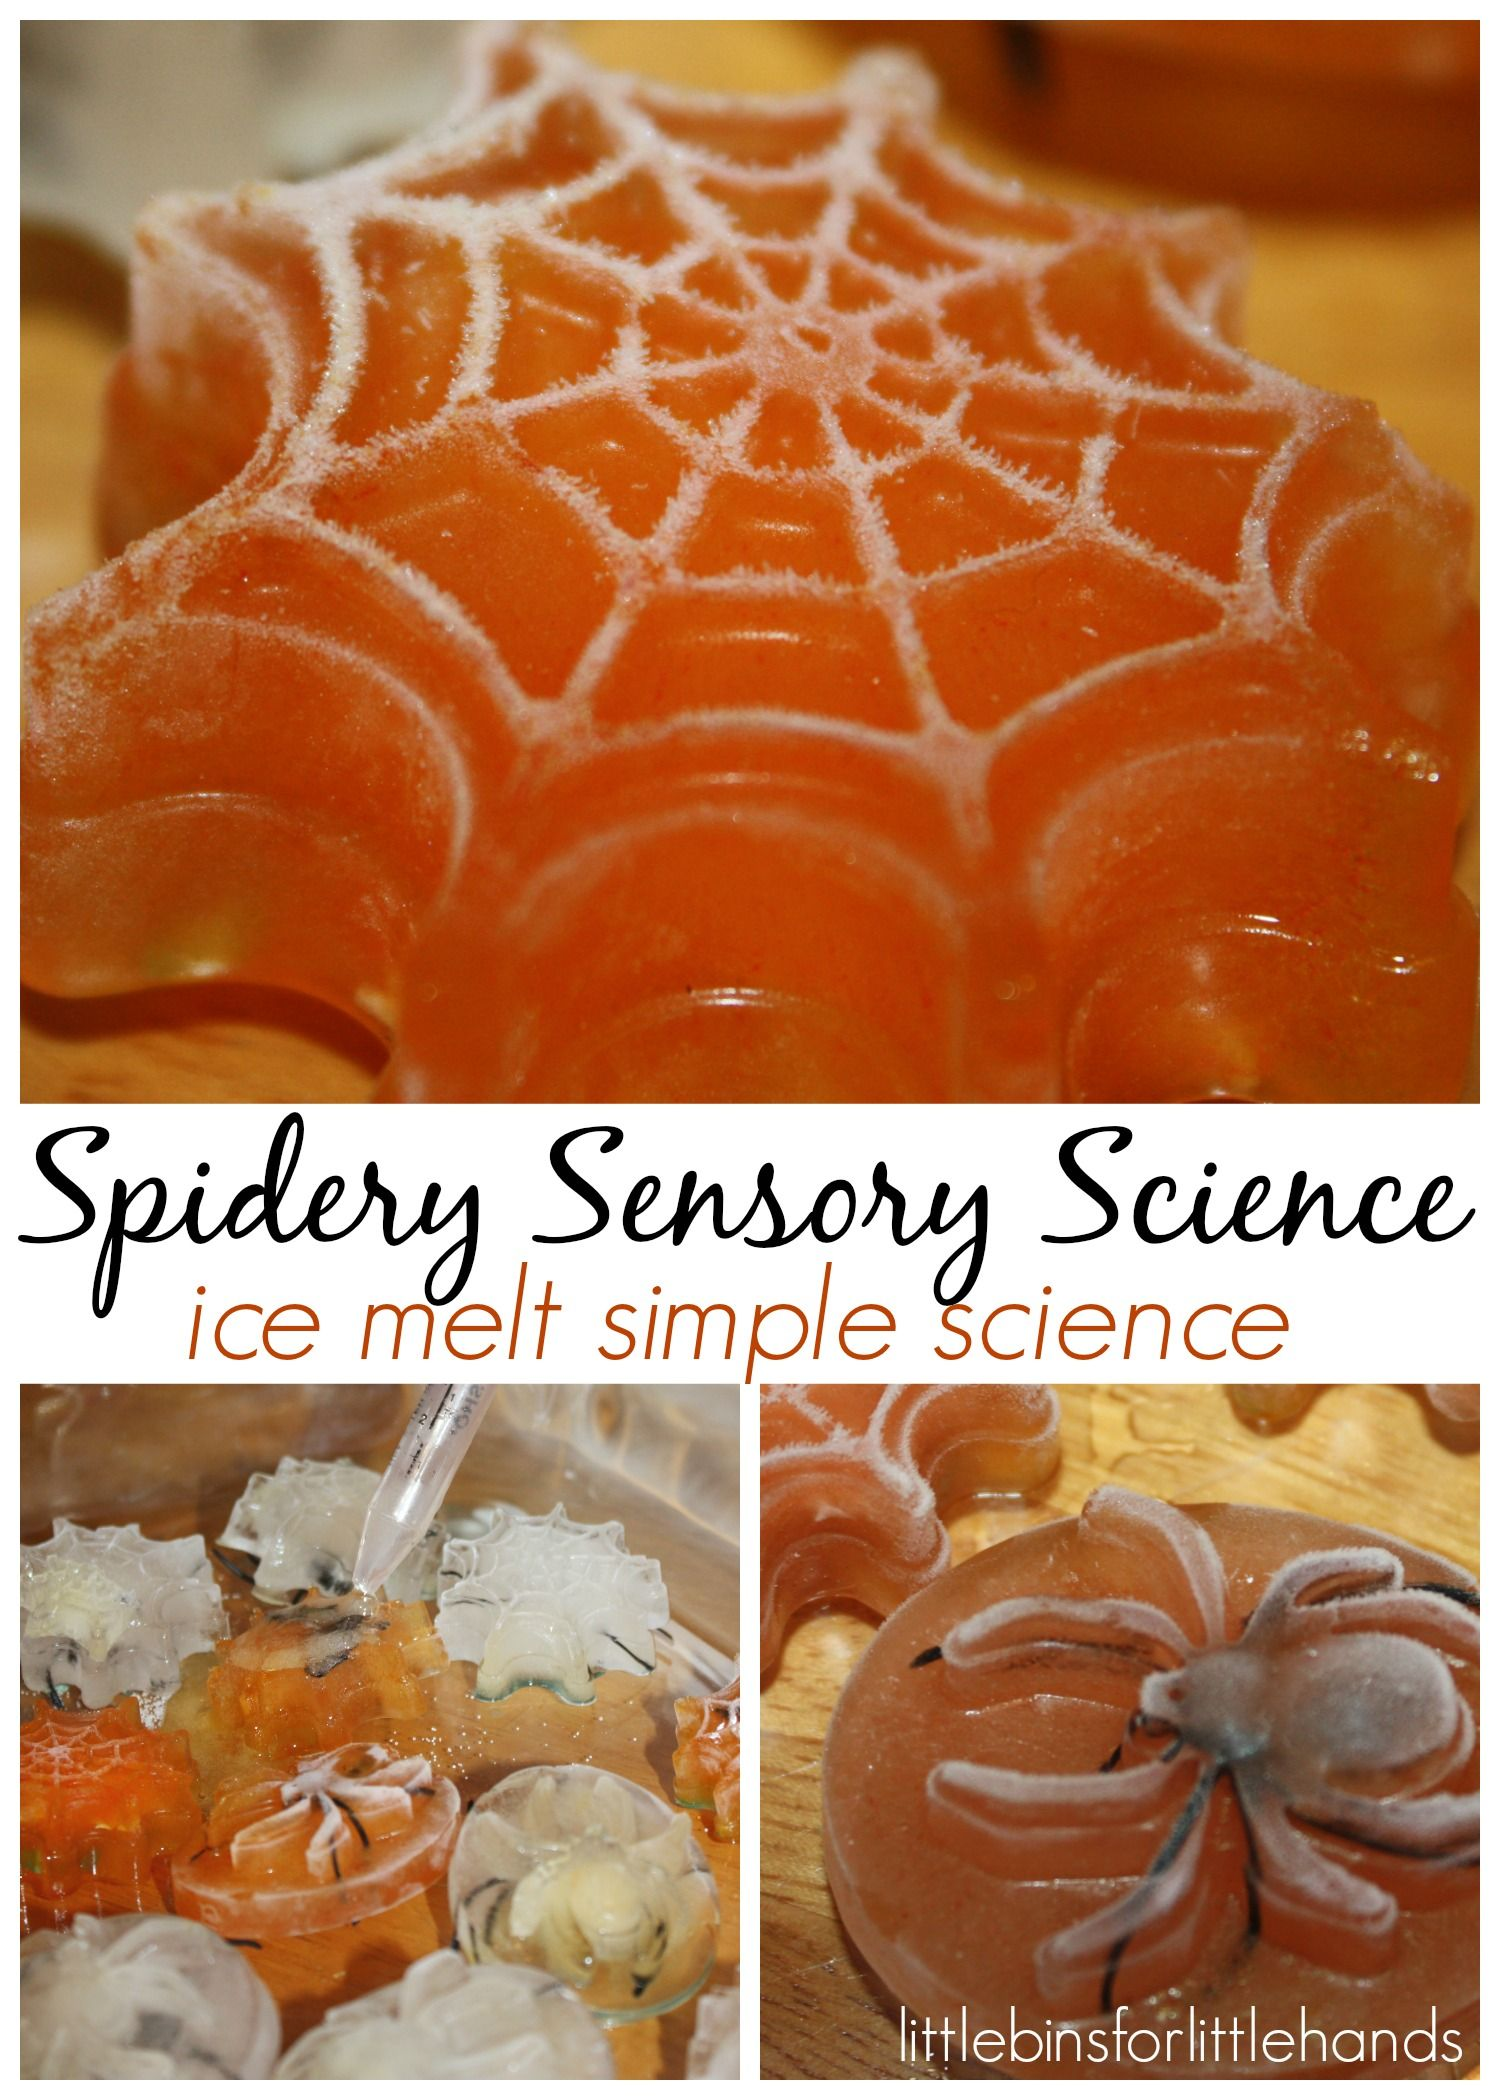 Halloween Spider Ice Melt Science Activity For Kids